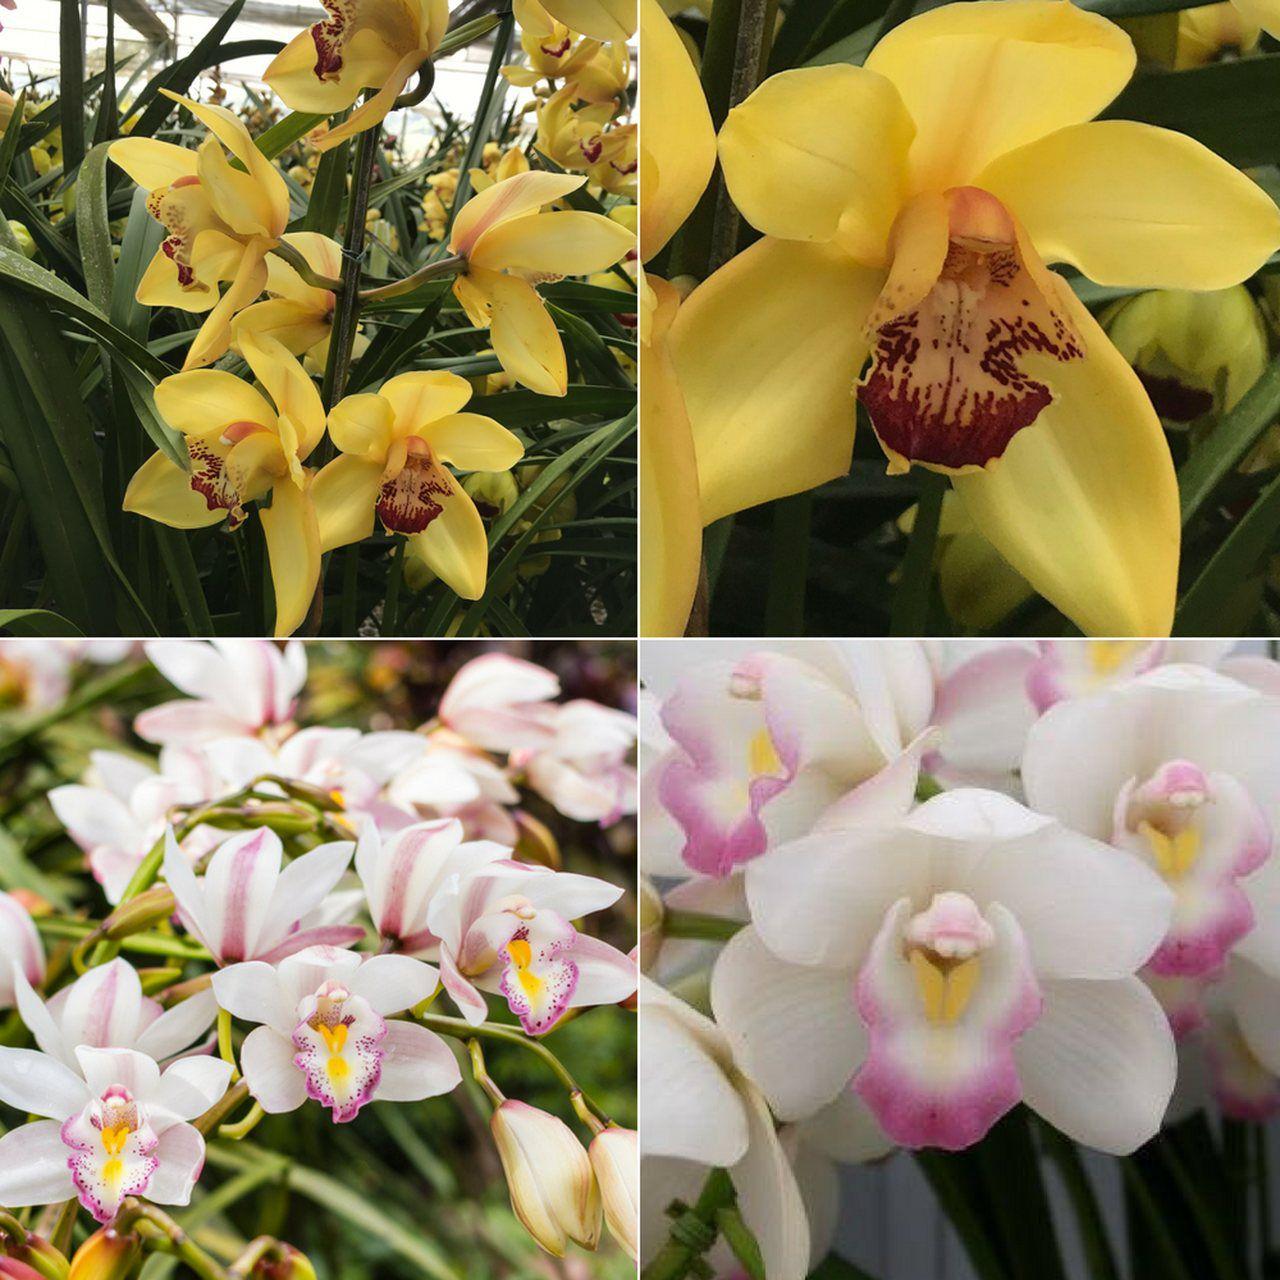 Kit 10 mudas adultas de Orquídea Cymbidium  - ORQUIDEA GARDEN